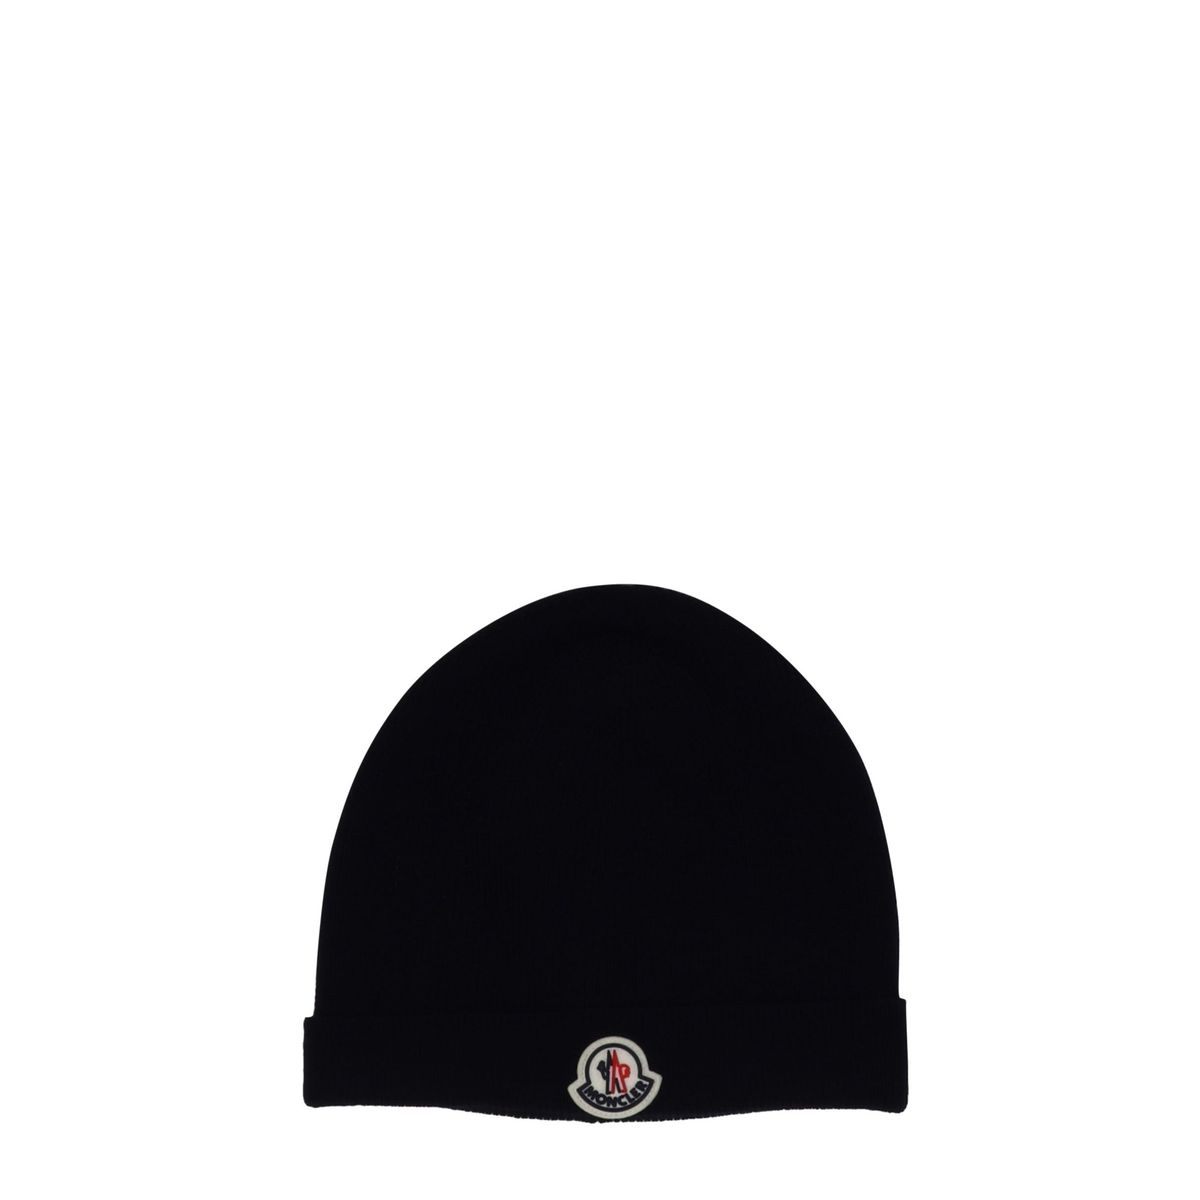 1. Moncler cap in wool blend Black Moncler